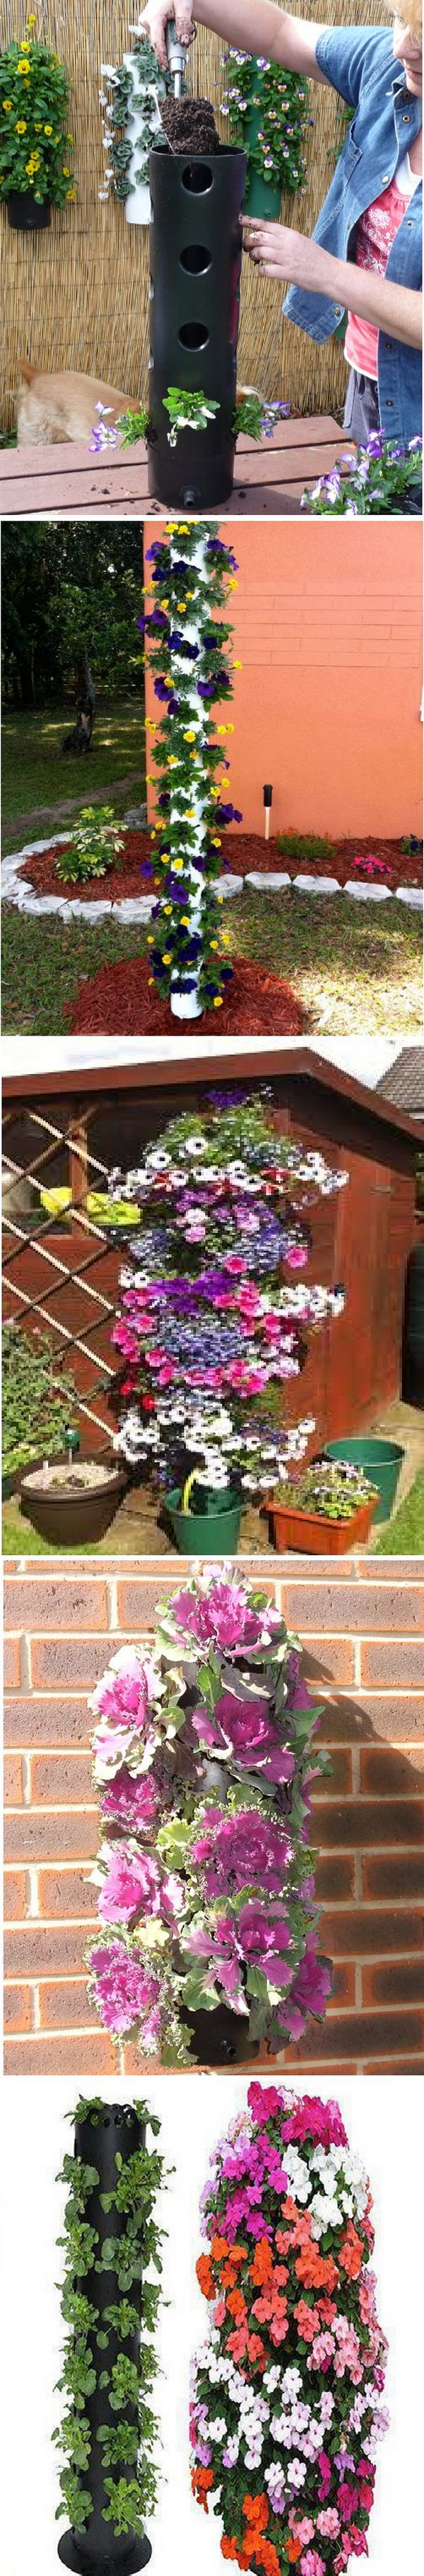 Polanter Vertical Gardening System